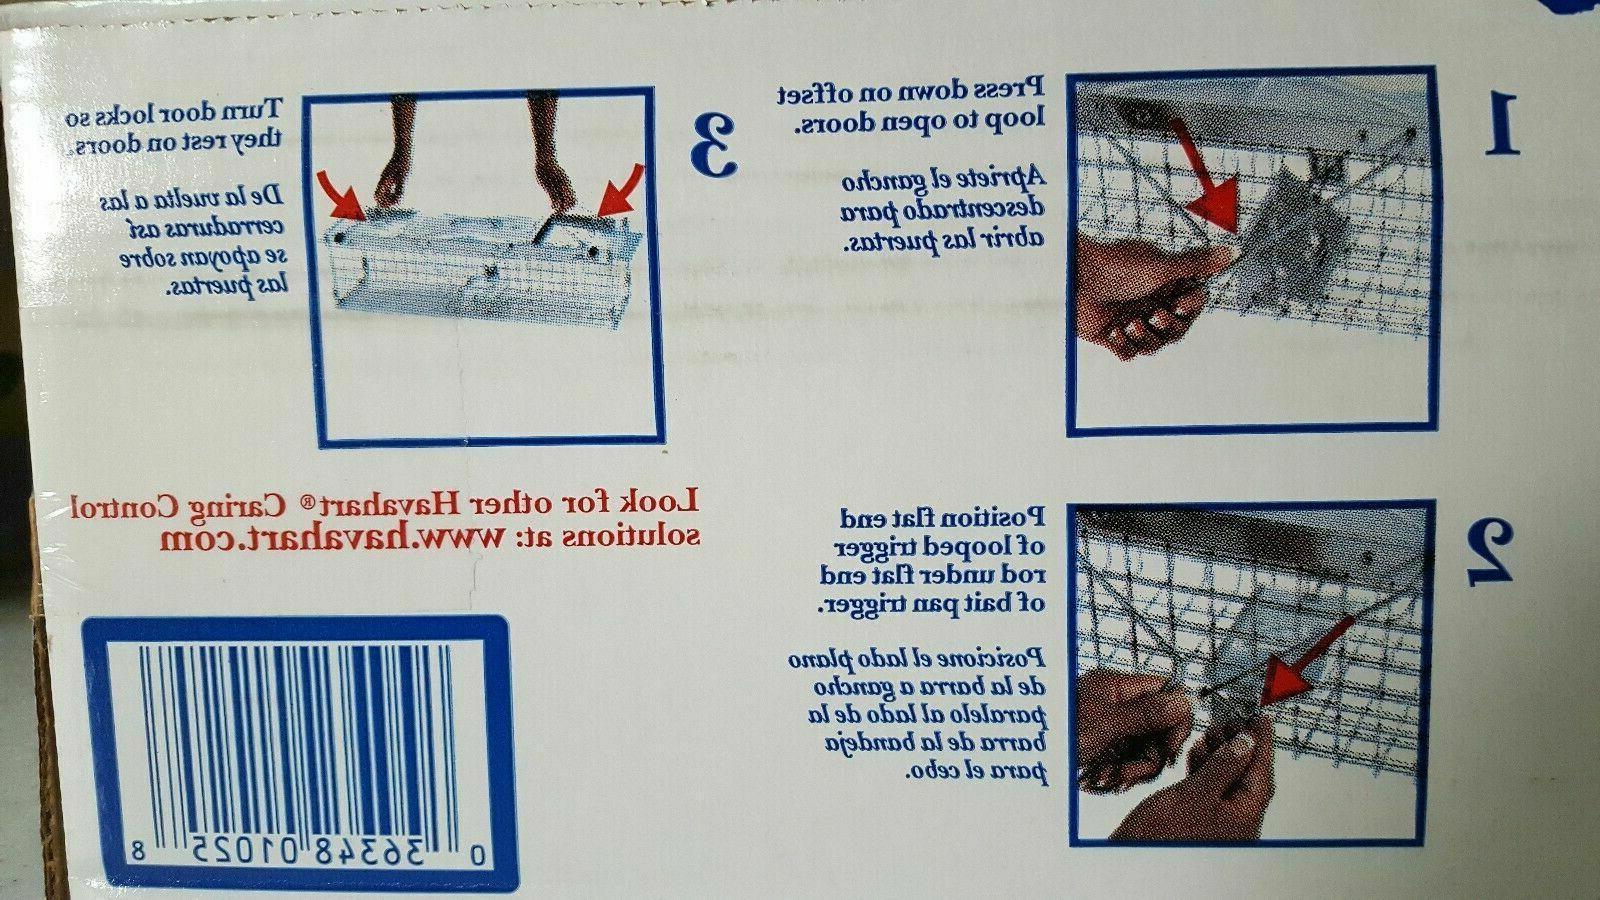 "HAVAHART MODEL ANIMAL CAGE TRAP Humane 18"" squirrels chipmunks rats"